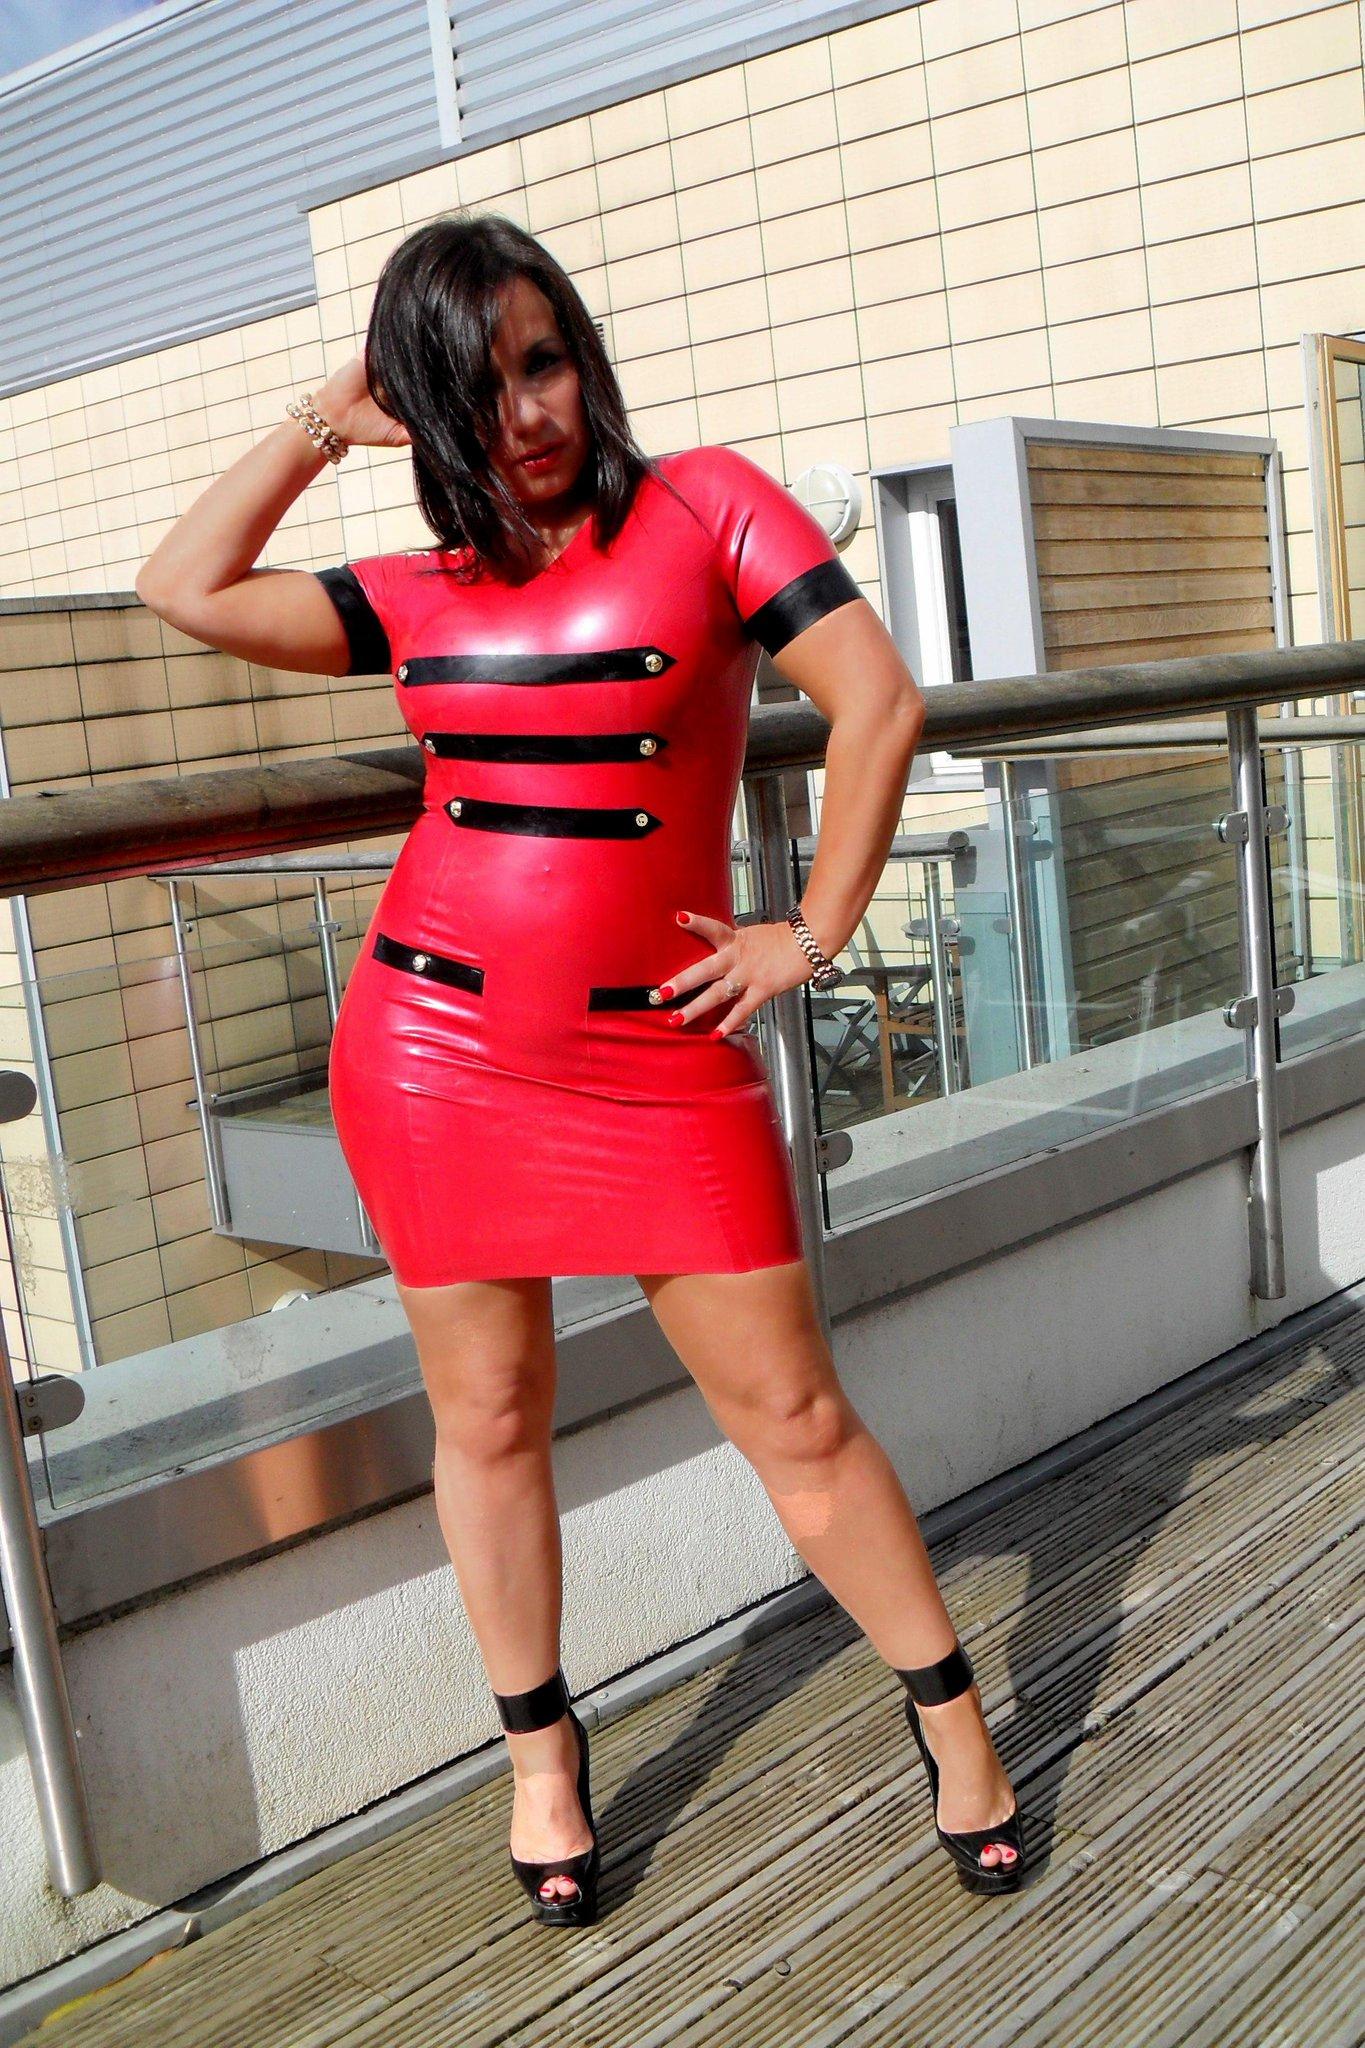 Mistress Real on Twitter: Just LURVVVE My new dress ! #